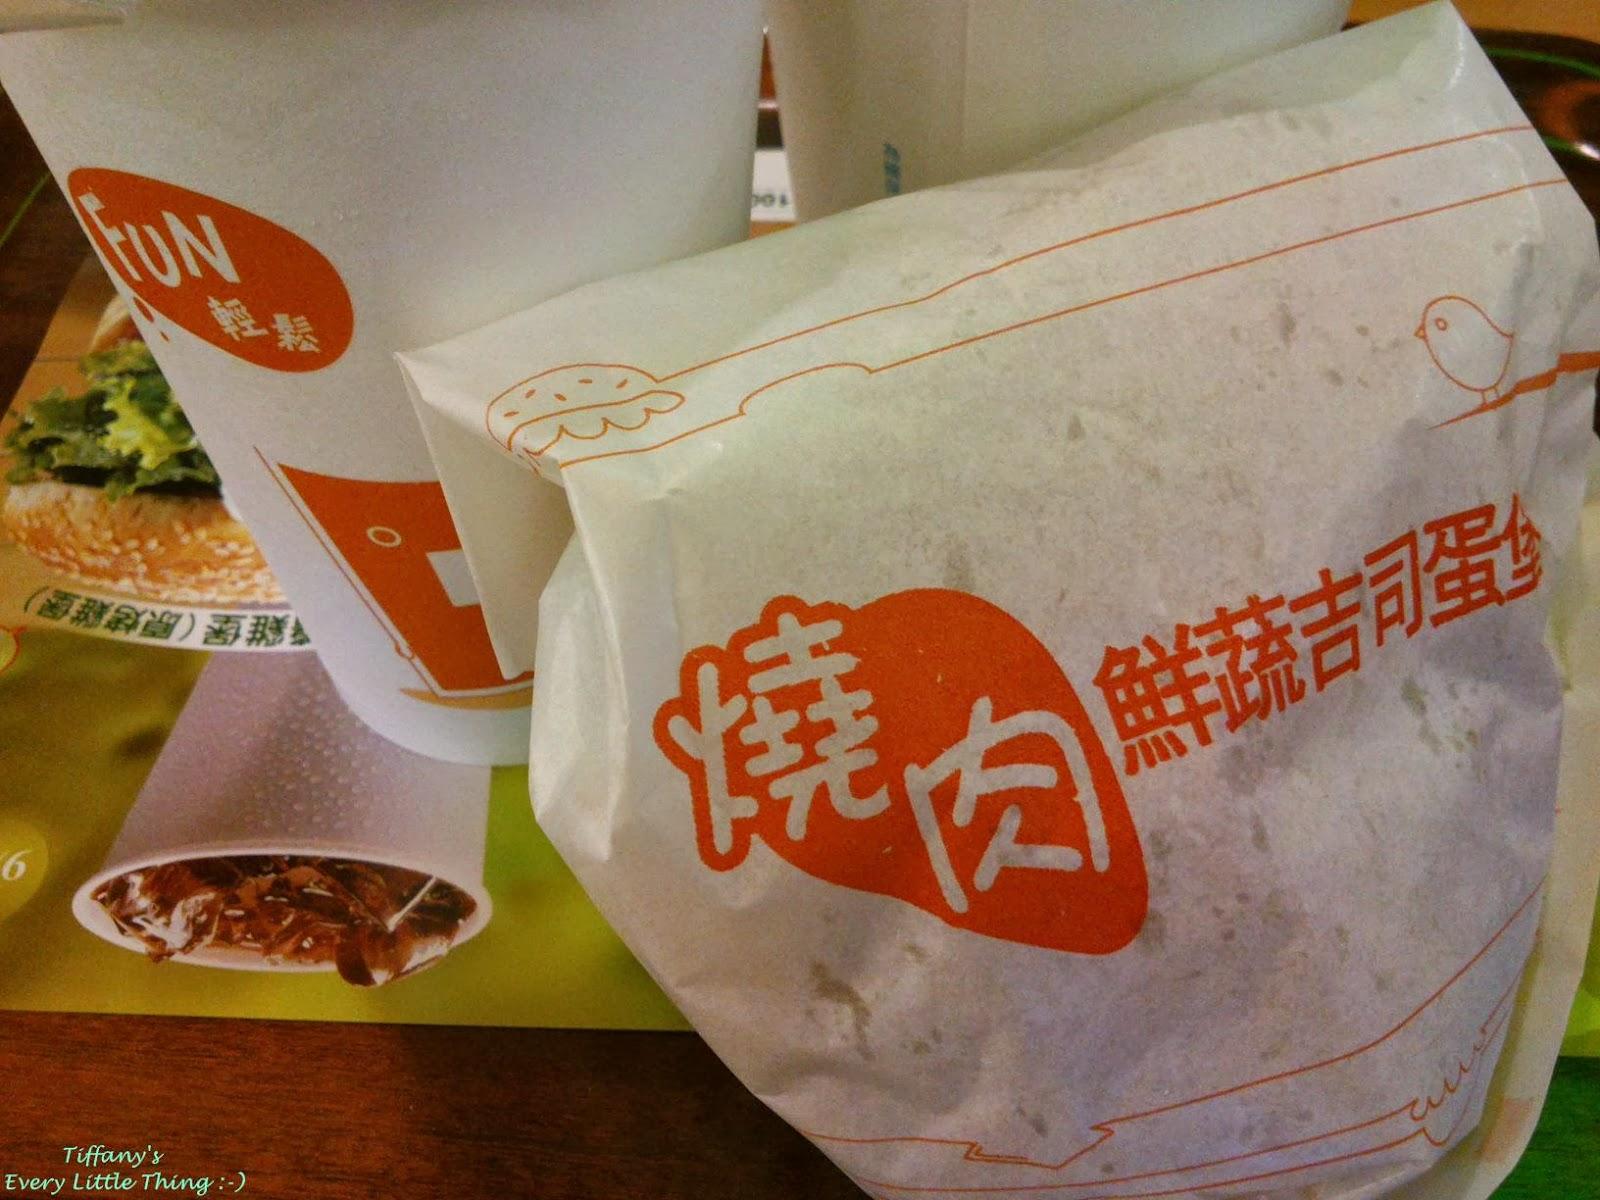 Tiffany's Every Little Thing: [365+170/365] 南霸天丹丹漢堡─燒肉鮮蔬吉司蛋堡